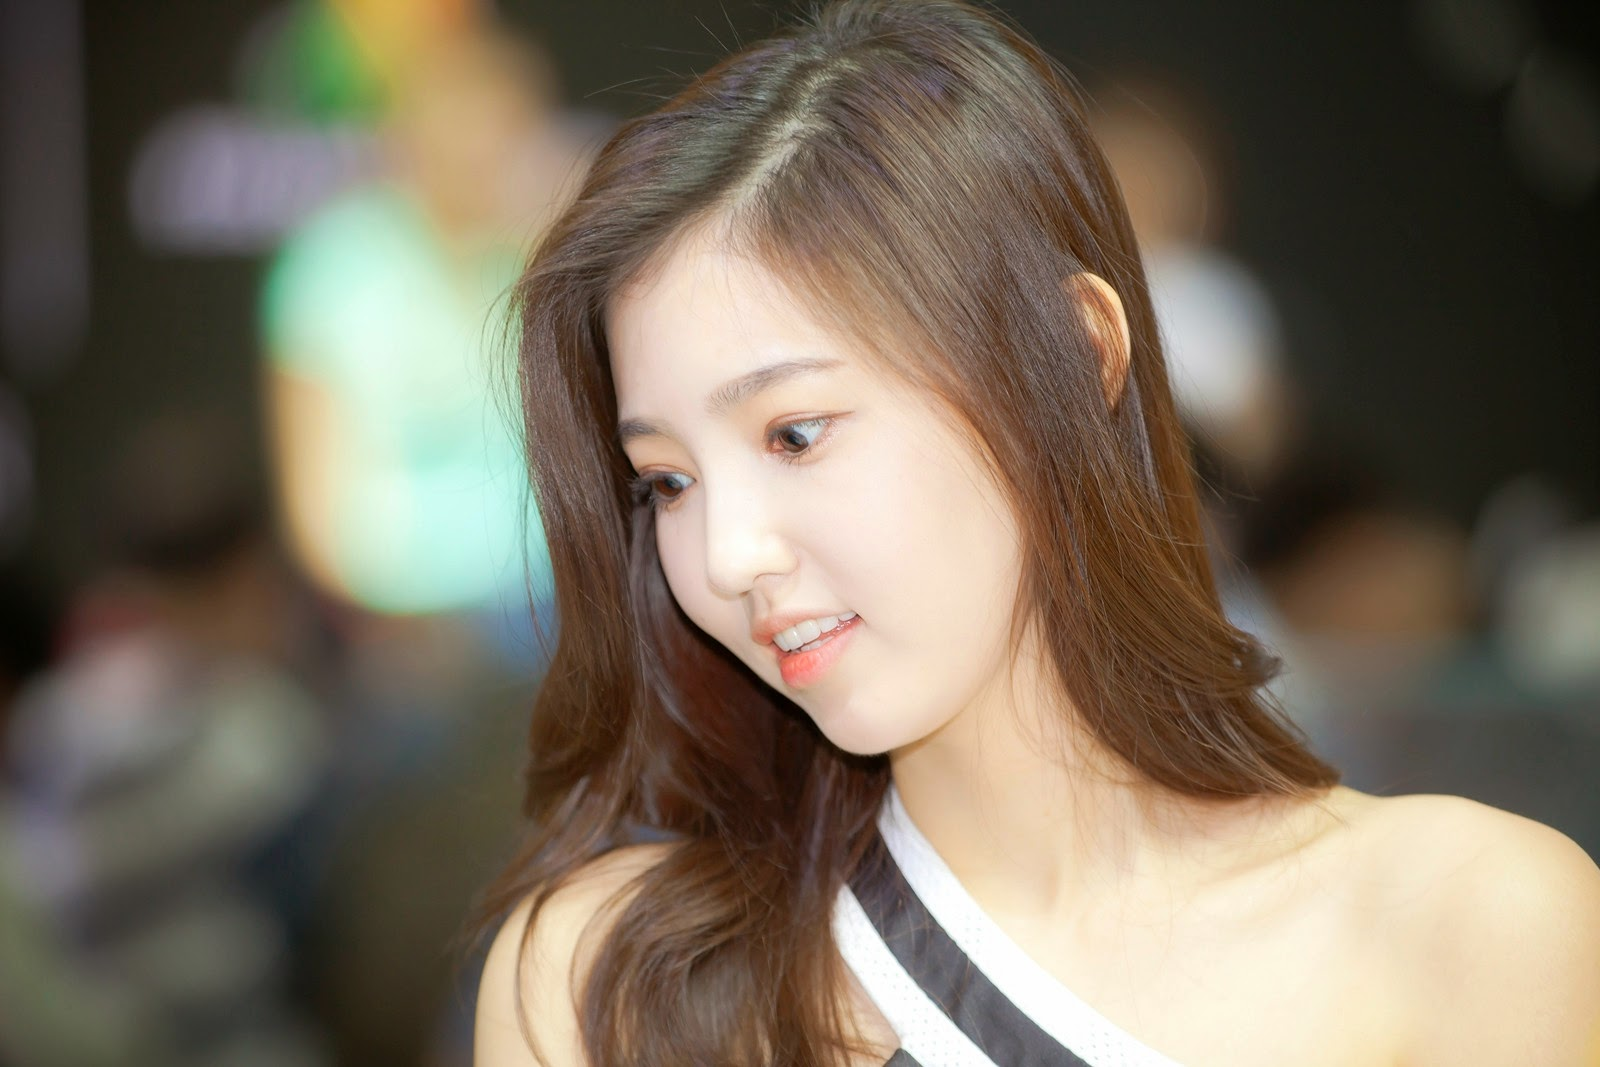 4 Kim Bo Ra - P&I 2014 - very cute asian girl-girlcute4u.blogspot.com